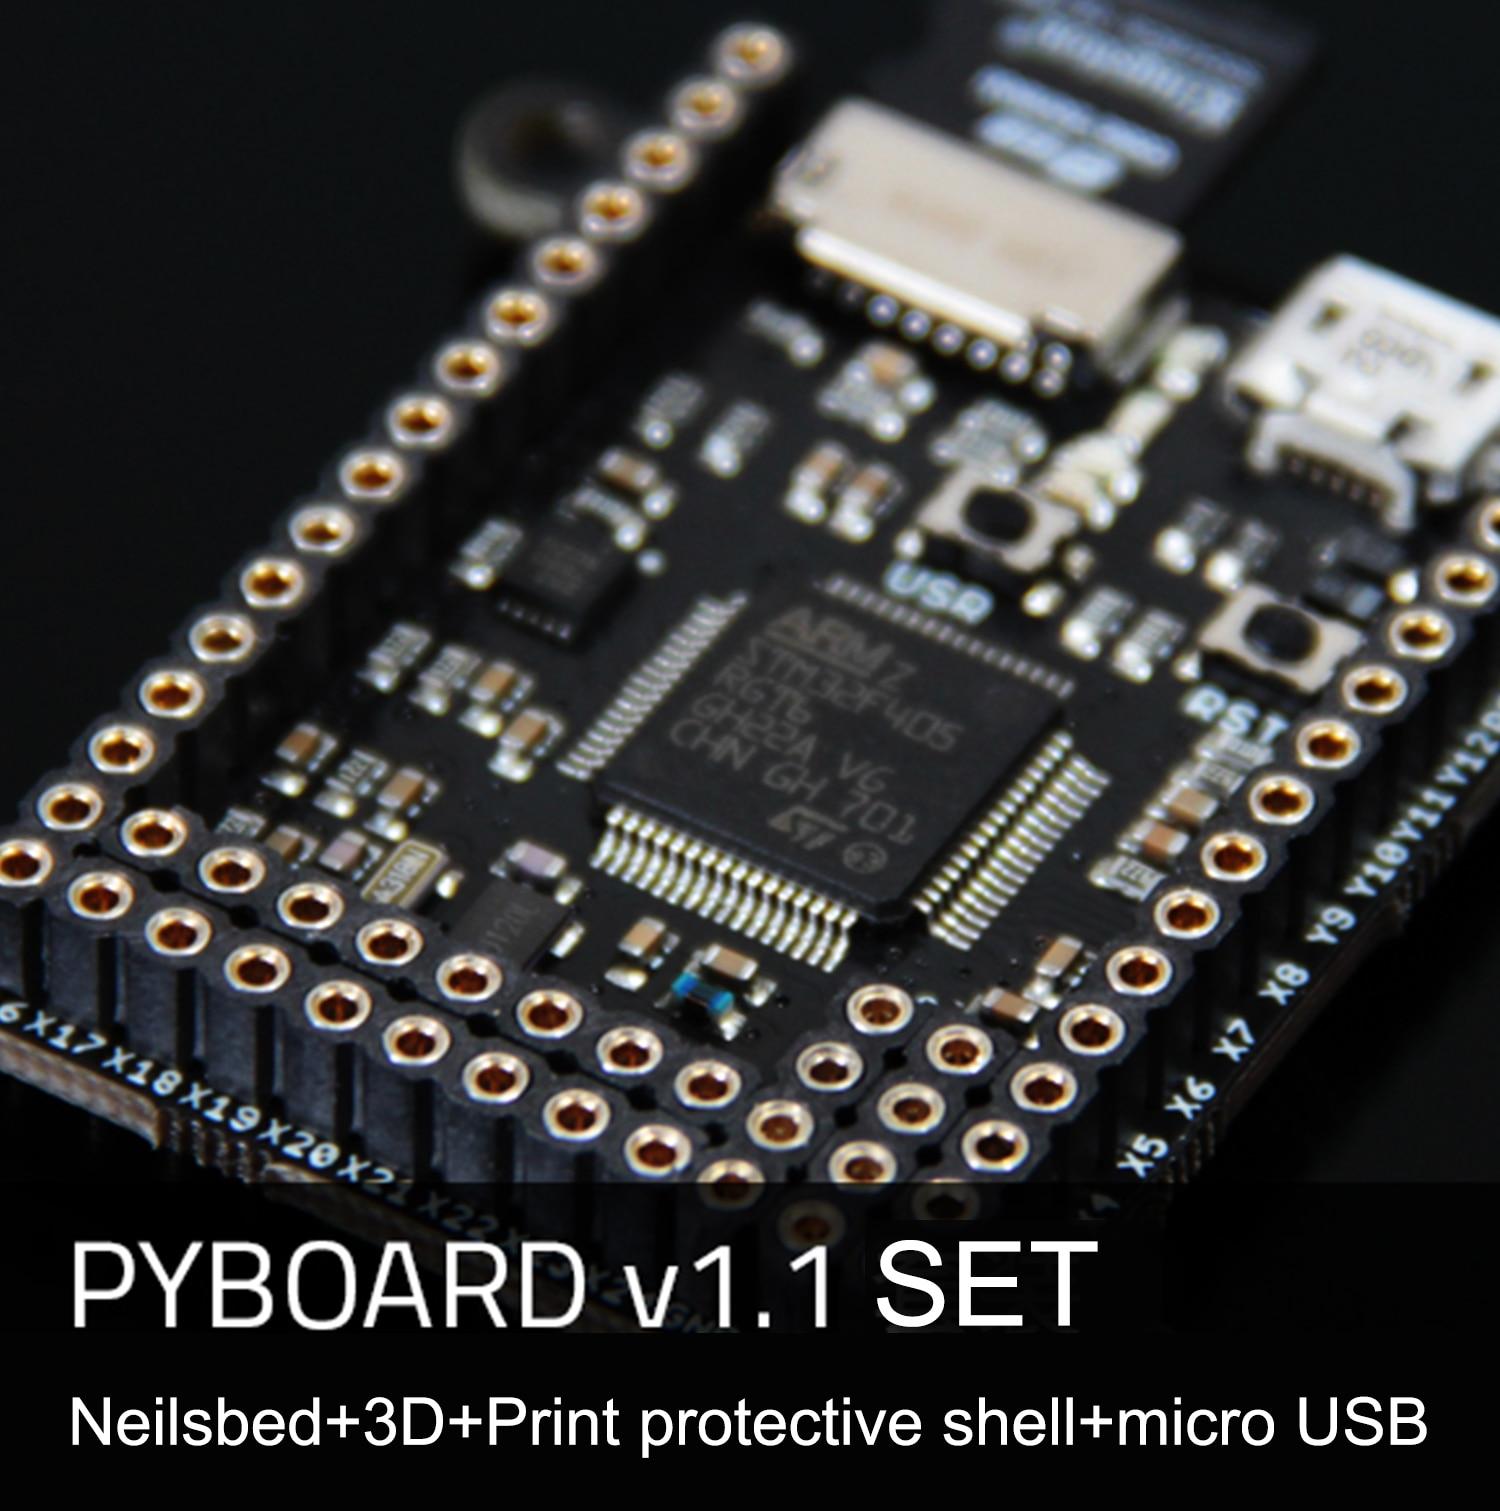 PyBoard V1.1 MicroPython Micro Python 3 cartes avec Base de broche boîtier d'impression 3D câble USB